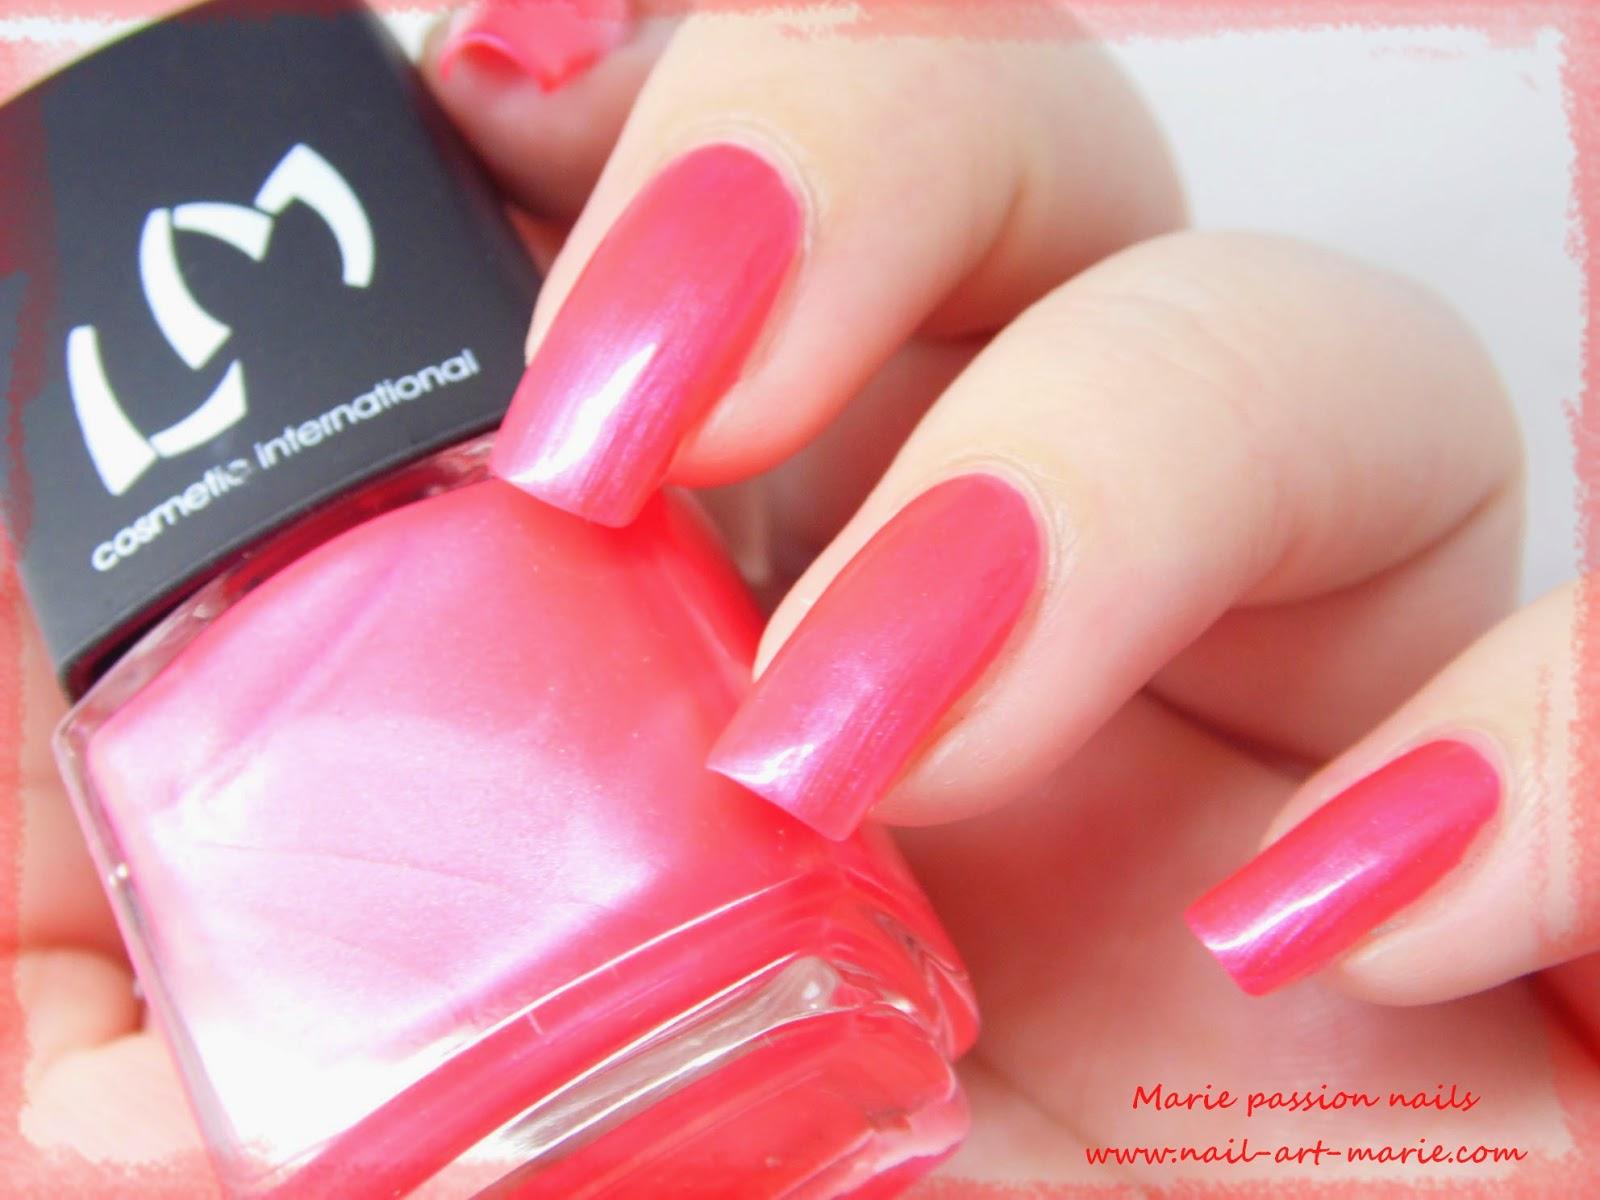 LM Cosmetic Fonte Nova9